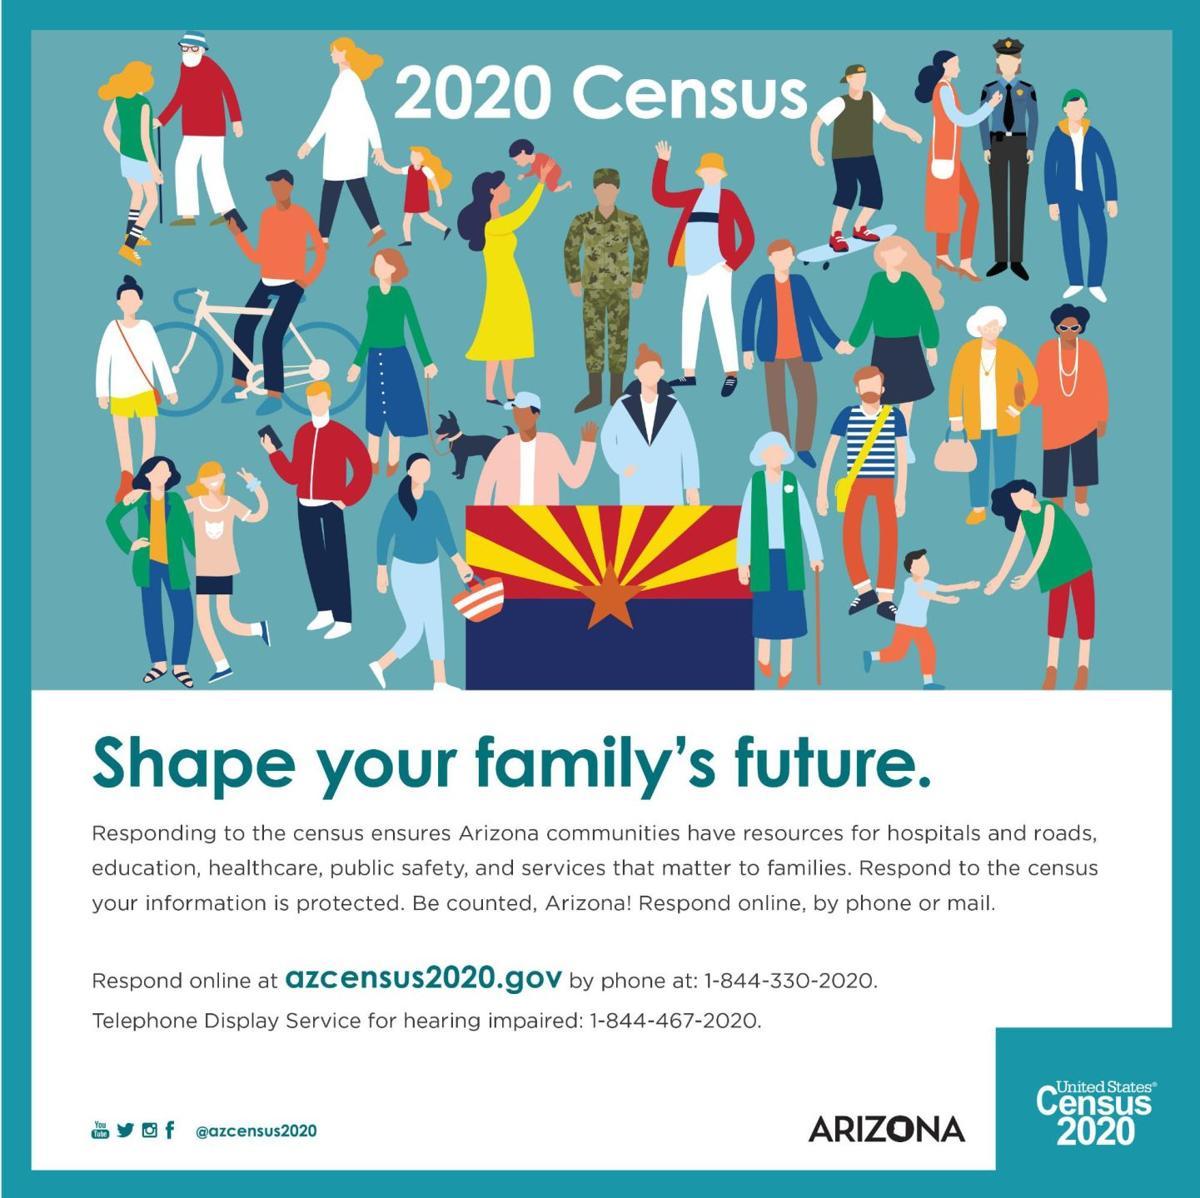 AZ Census 2020